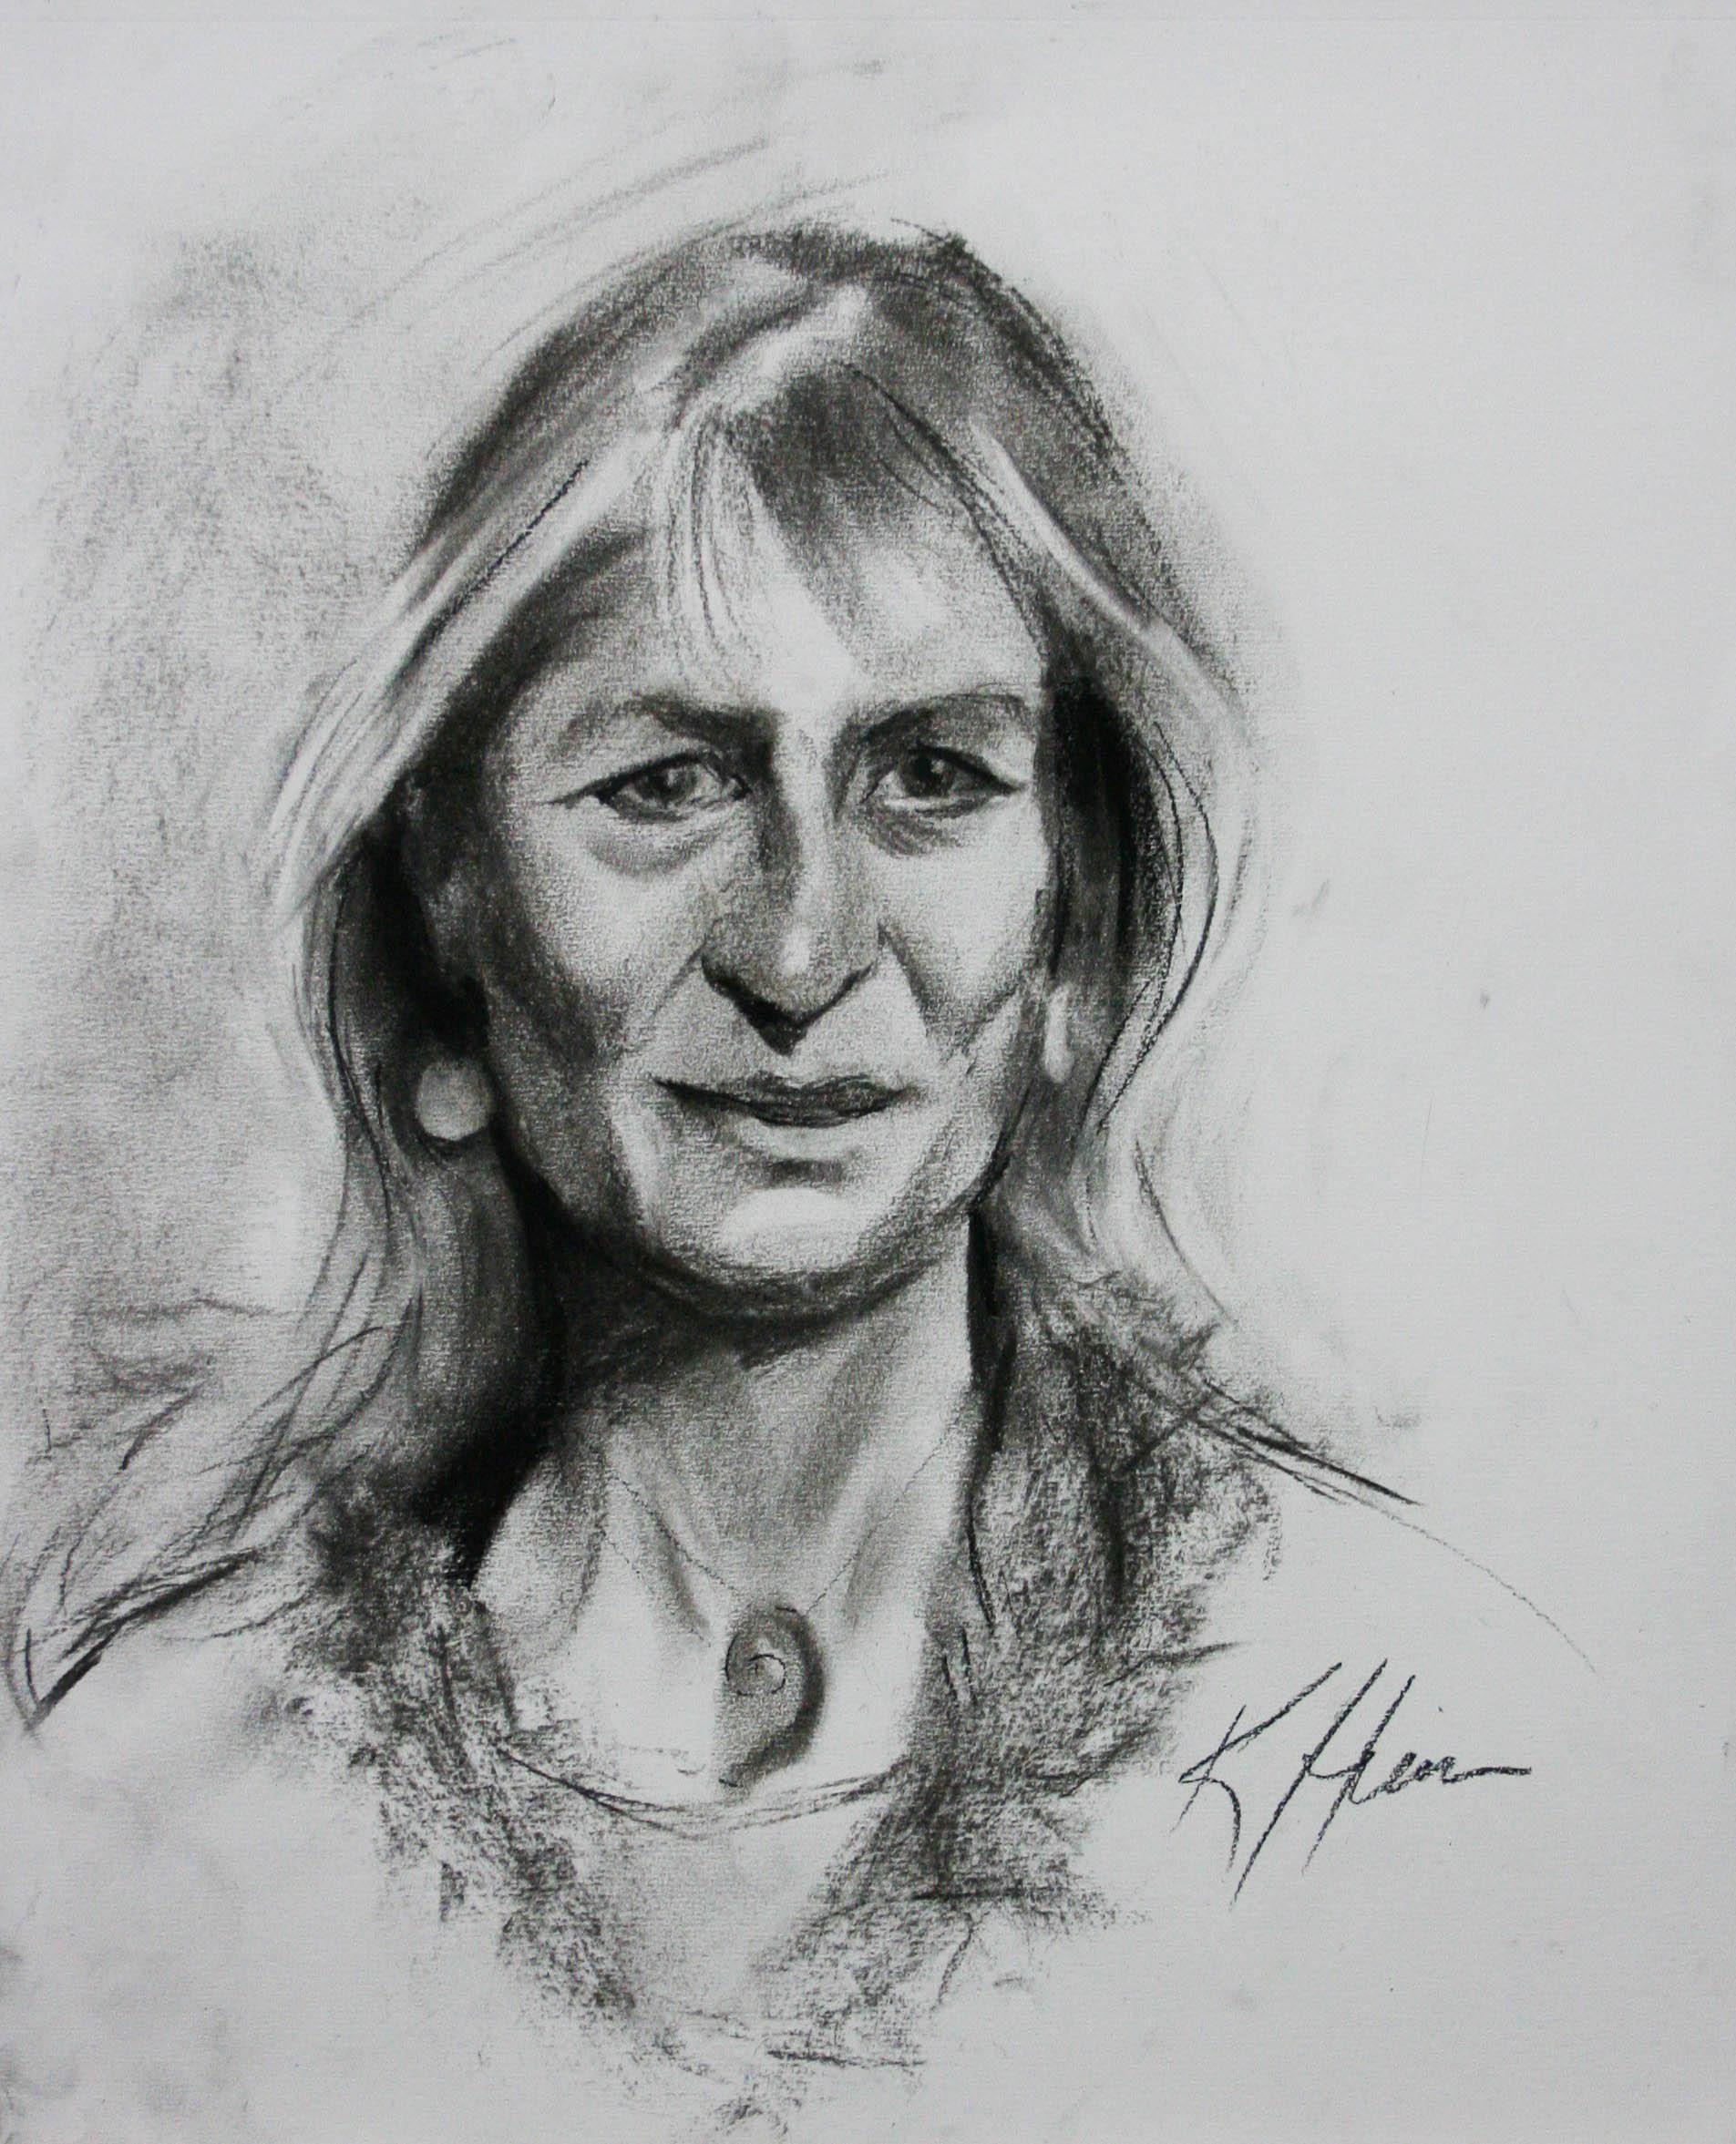 Kathryn Heim did this half hour drawing.